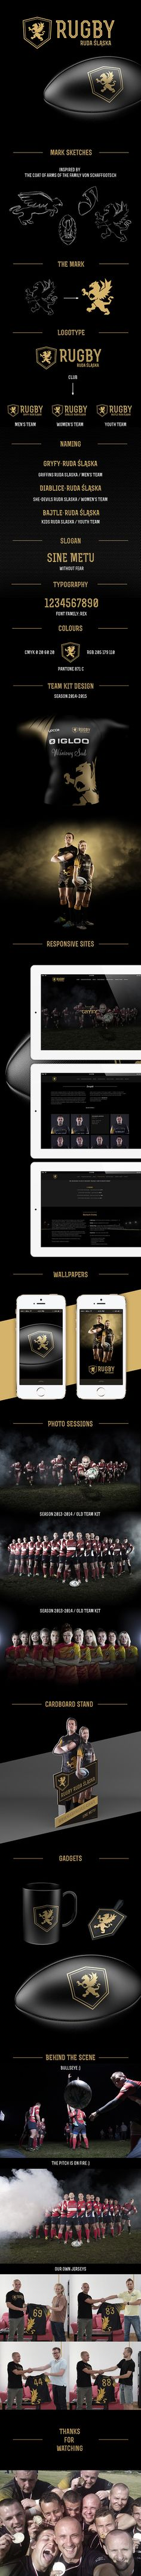 Rugby Ruda Slaska  by Damian Szews, via Behance